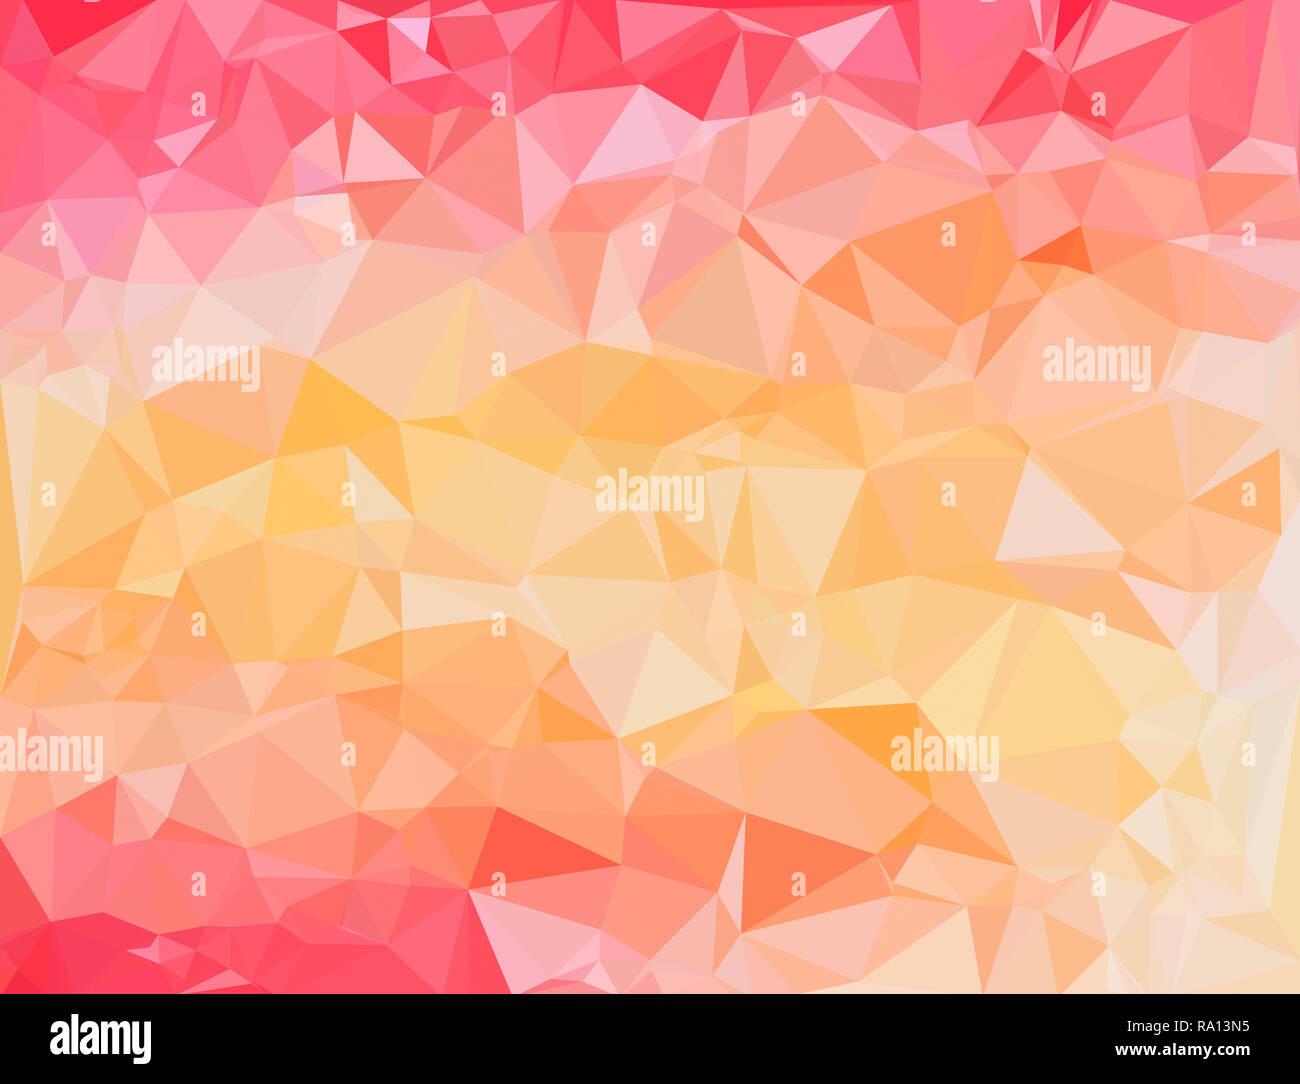 High Resolution Futuristic Colorful Polygon Mosaic Vector